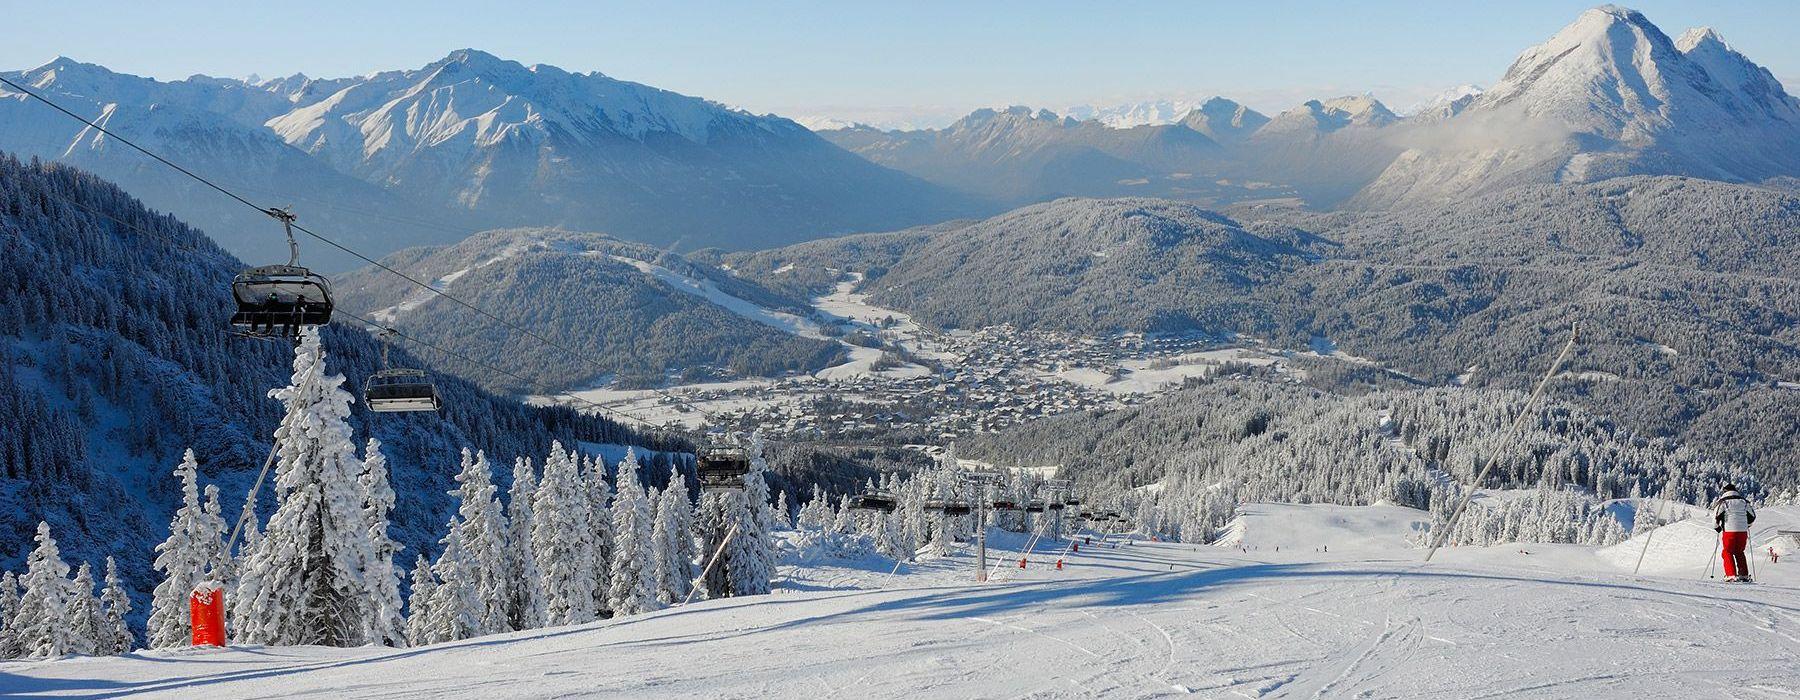 Skigebiet Rosshütte in Seefeld in Tirol